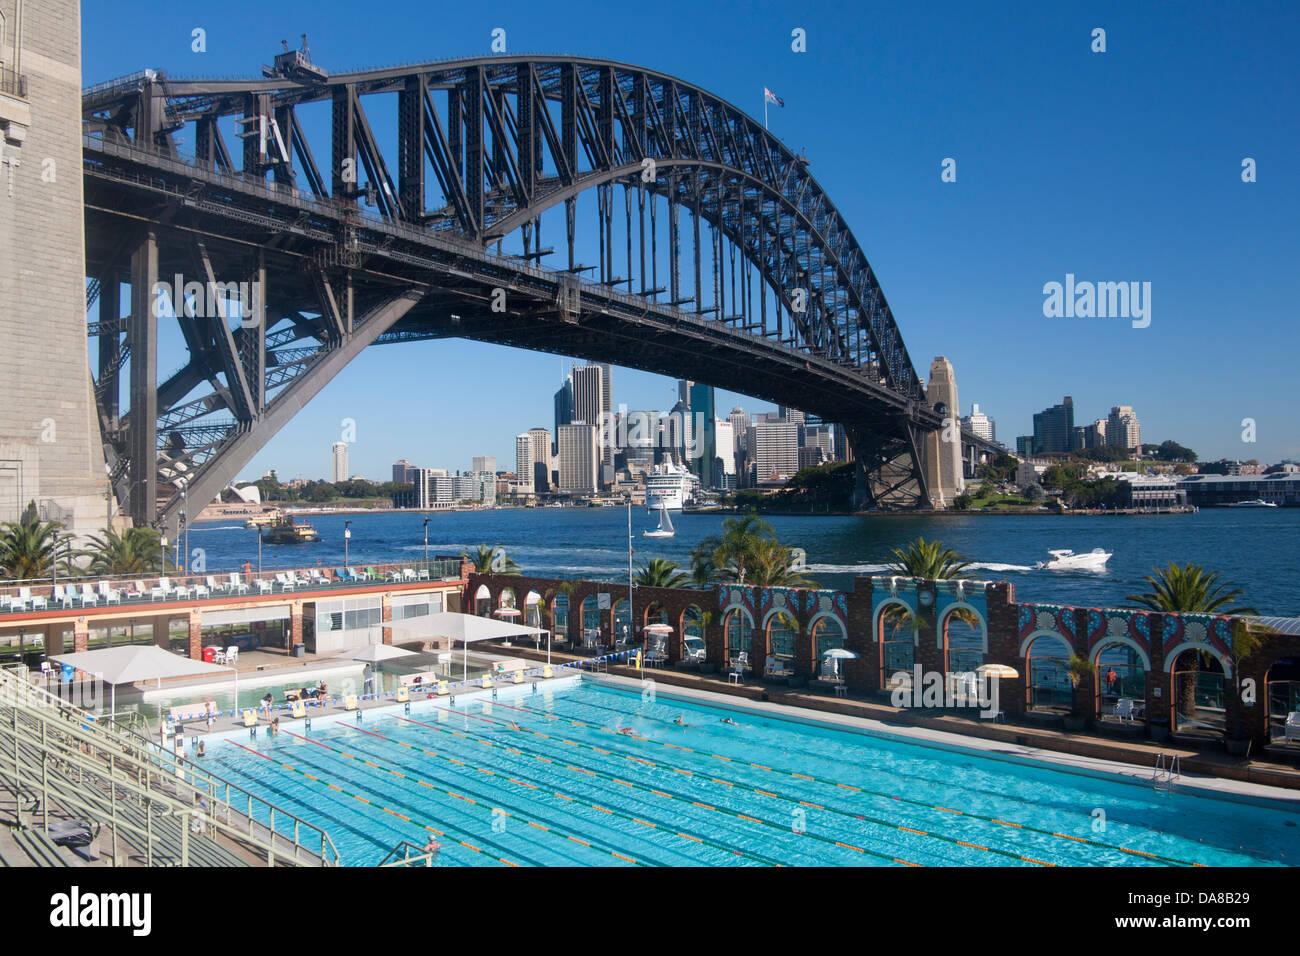 north sydney olympic pool with sydney harbour bridge and cbd skyline stock photo 57961969 alamy